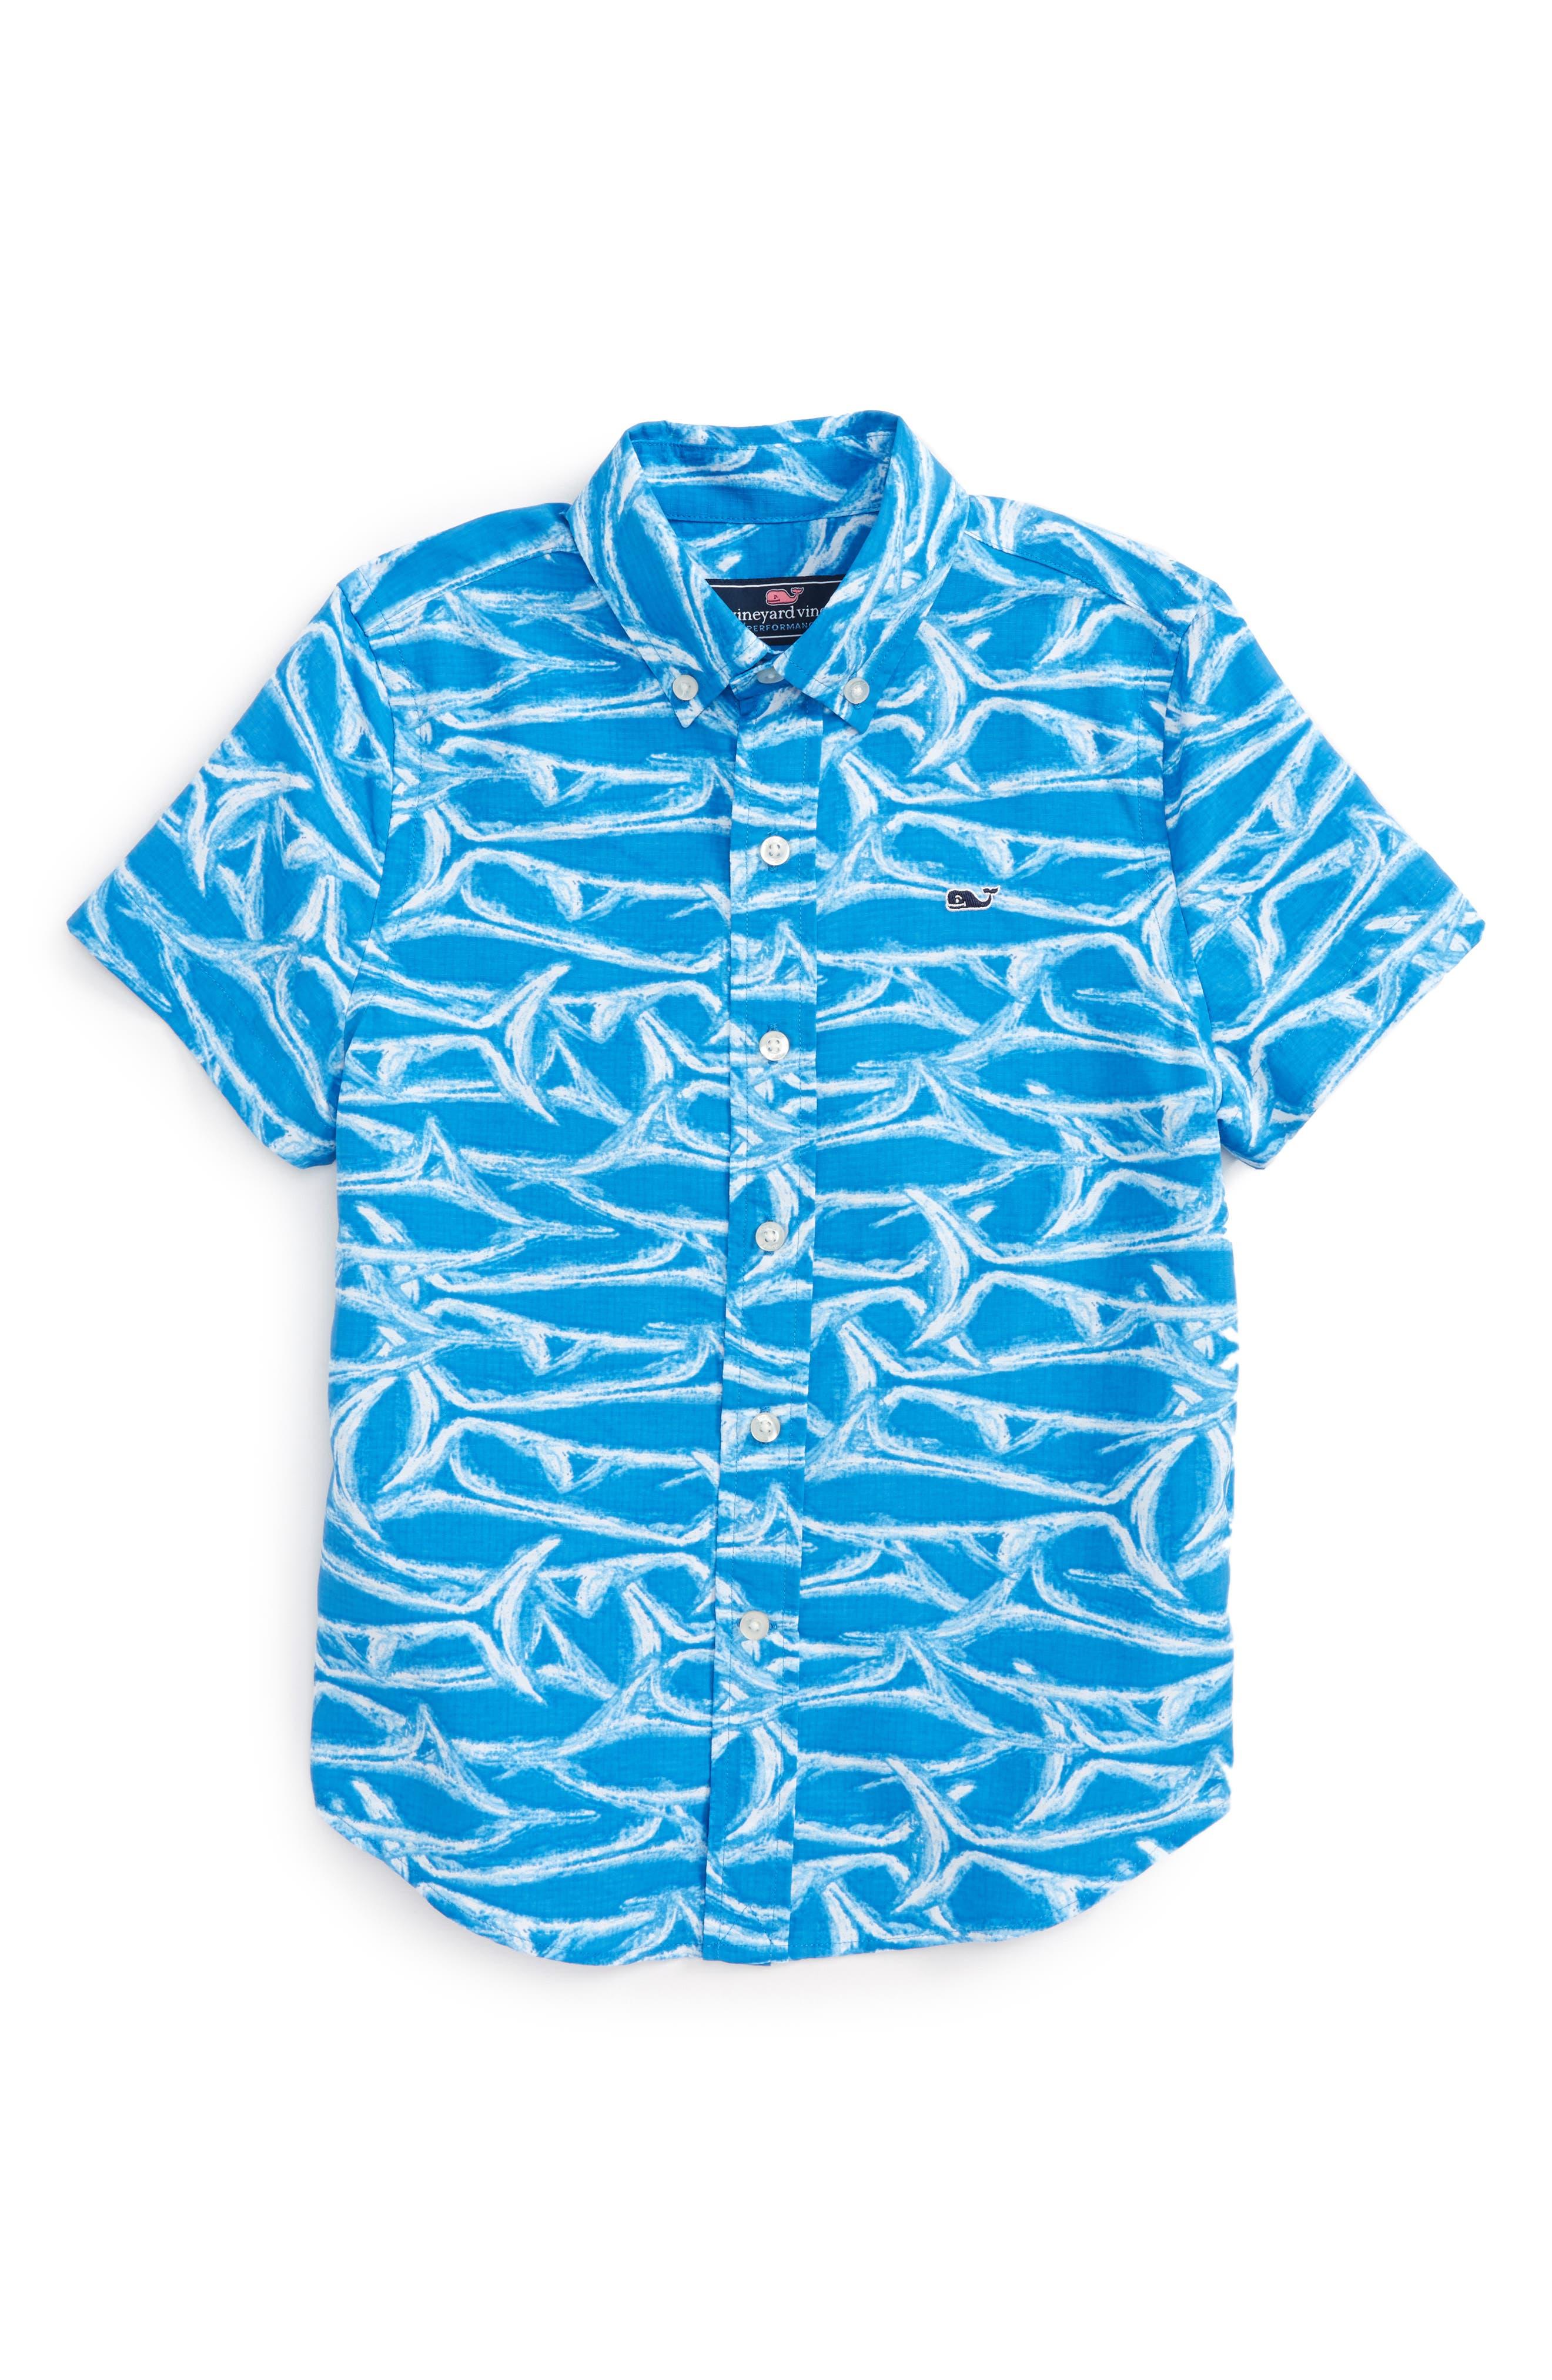 Brushed Marlin Whale Shirt,                             Main thumbnail 1, color,                             Hull Blue